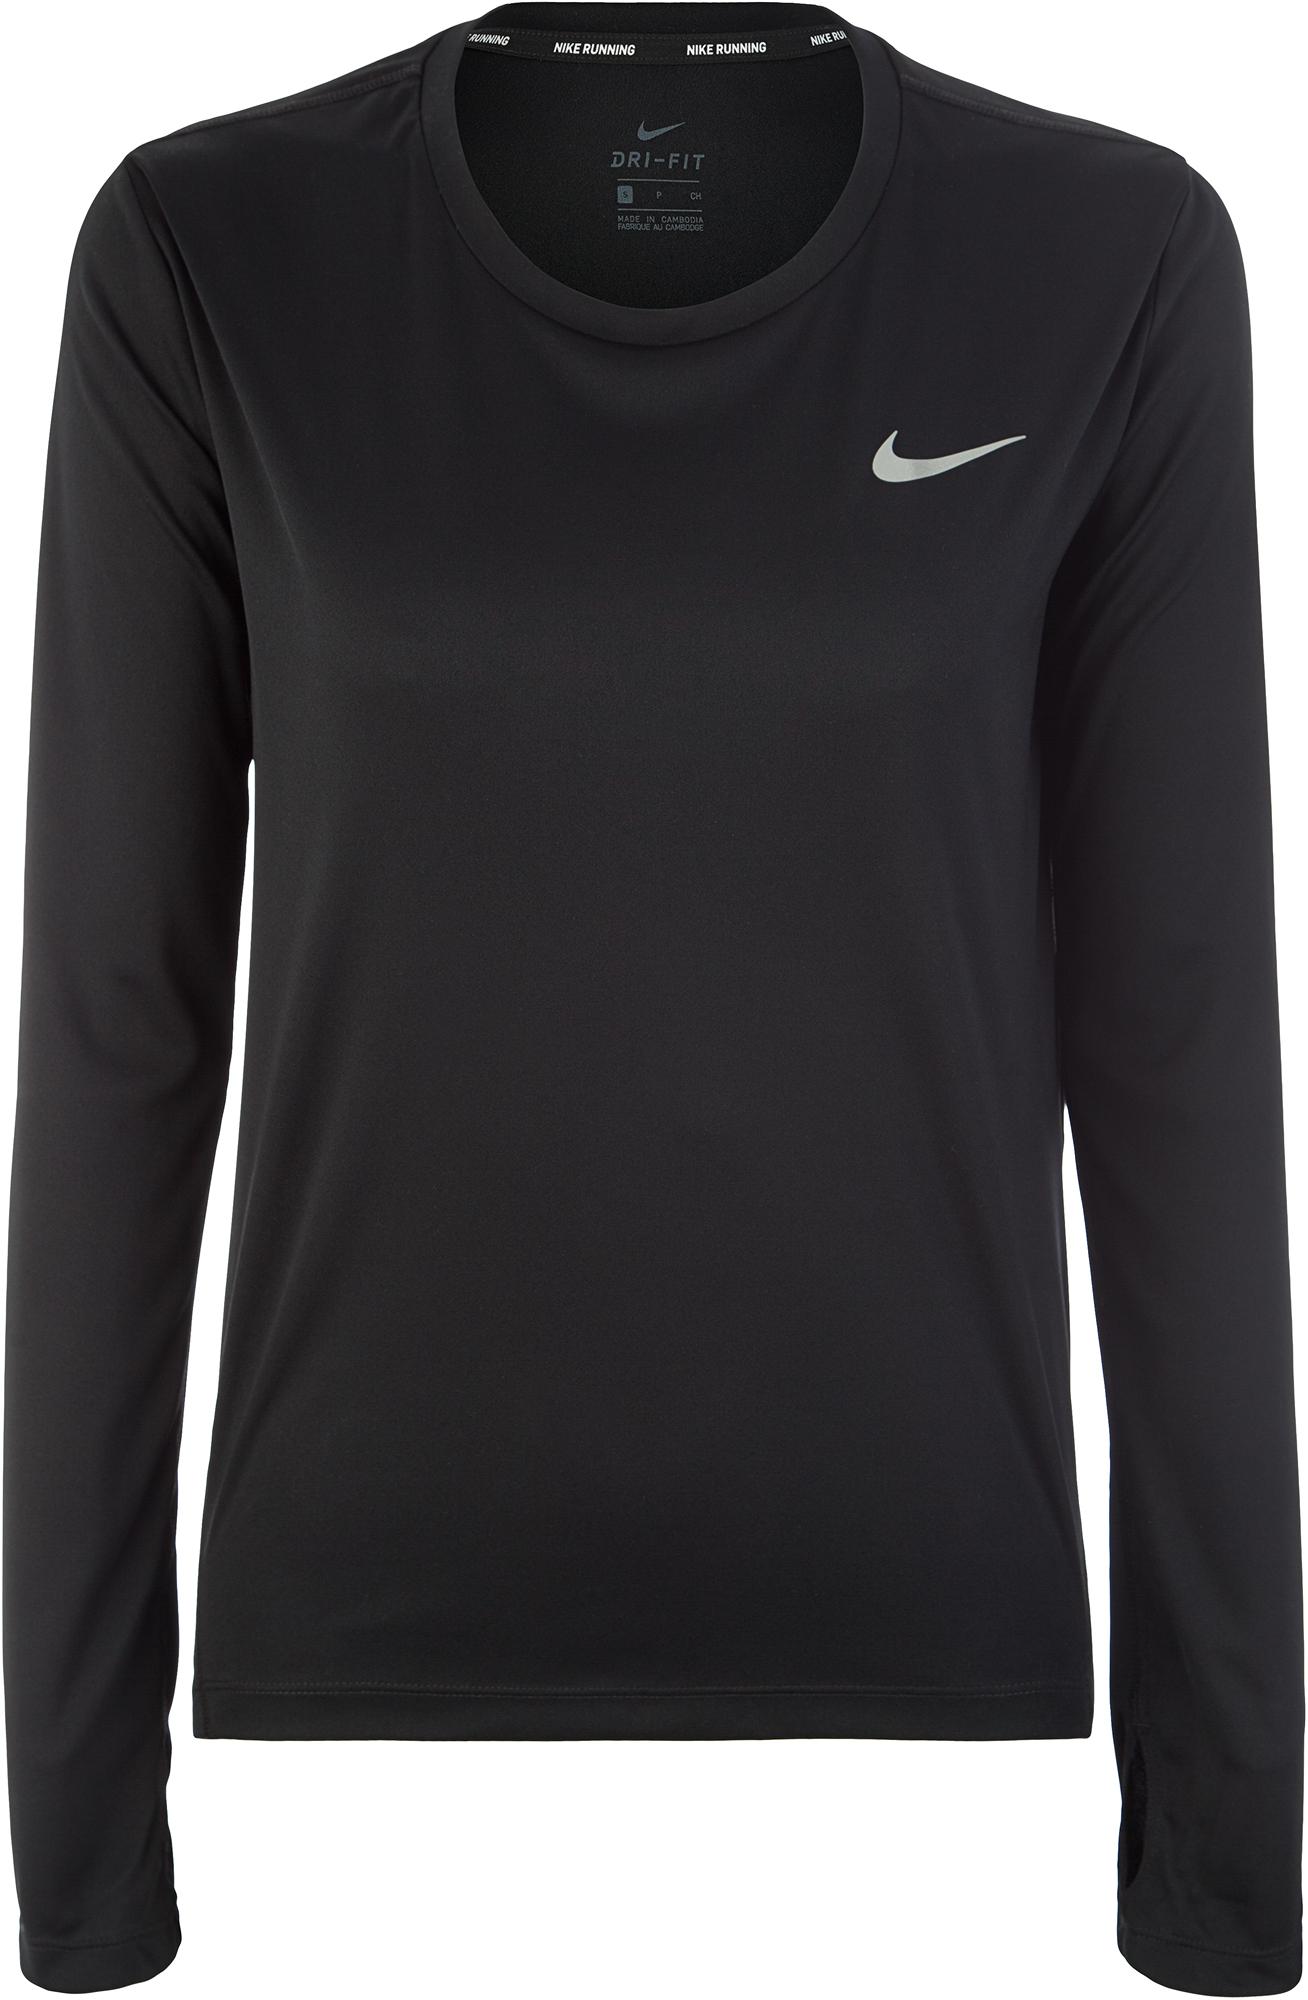 Nike Футболка с длинным рукавом женская Nike Miler, размер 46-48 цена